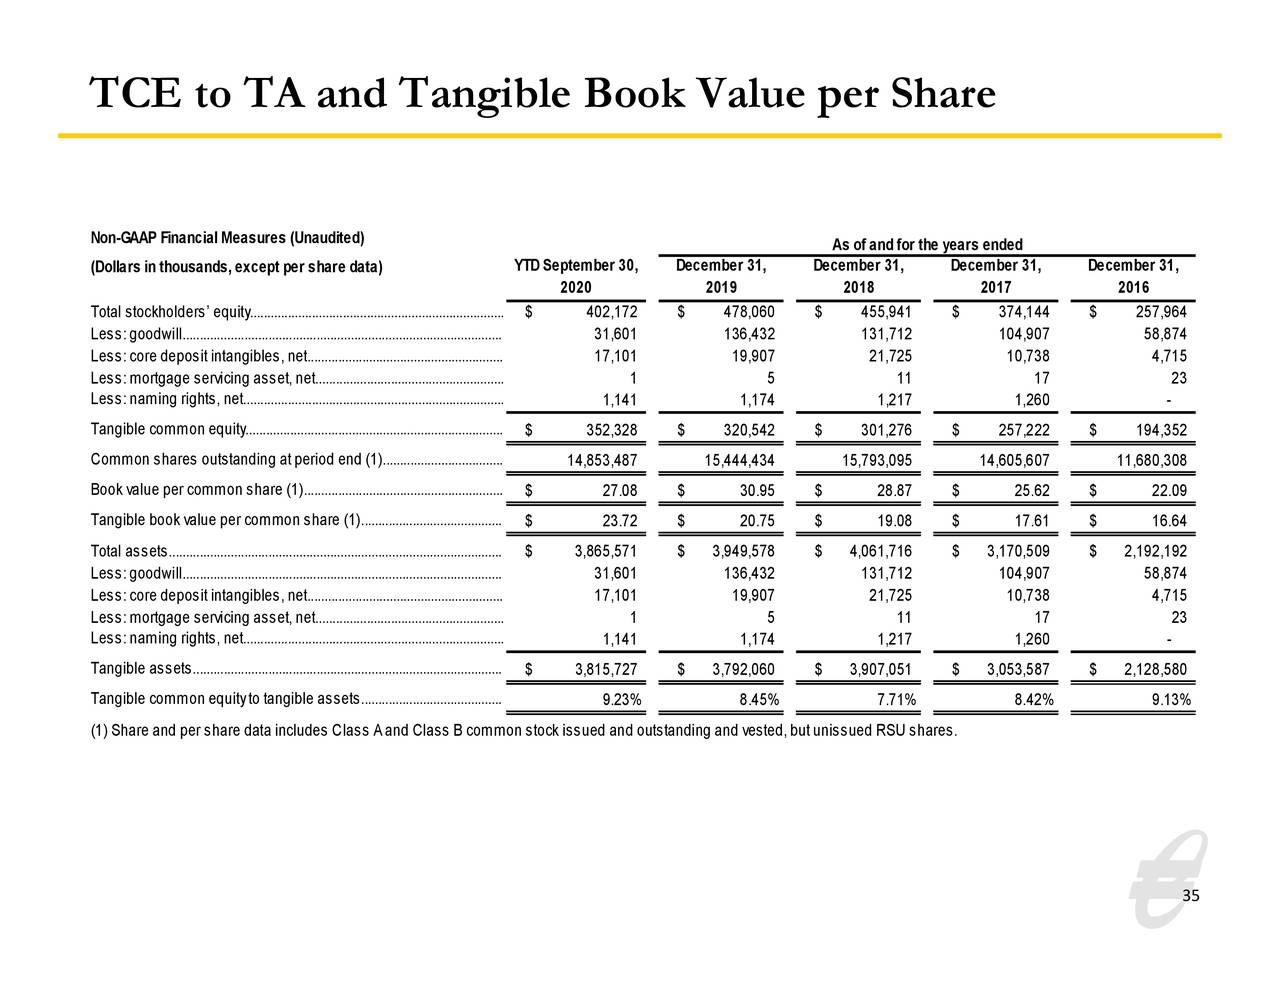 TCE a TA y valor contable tangible por acción